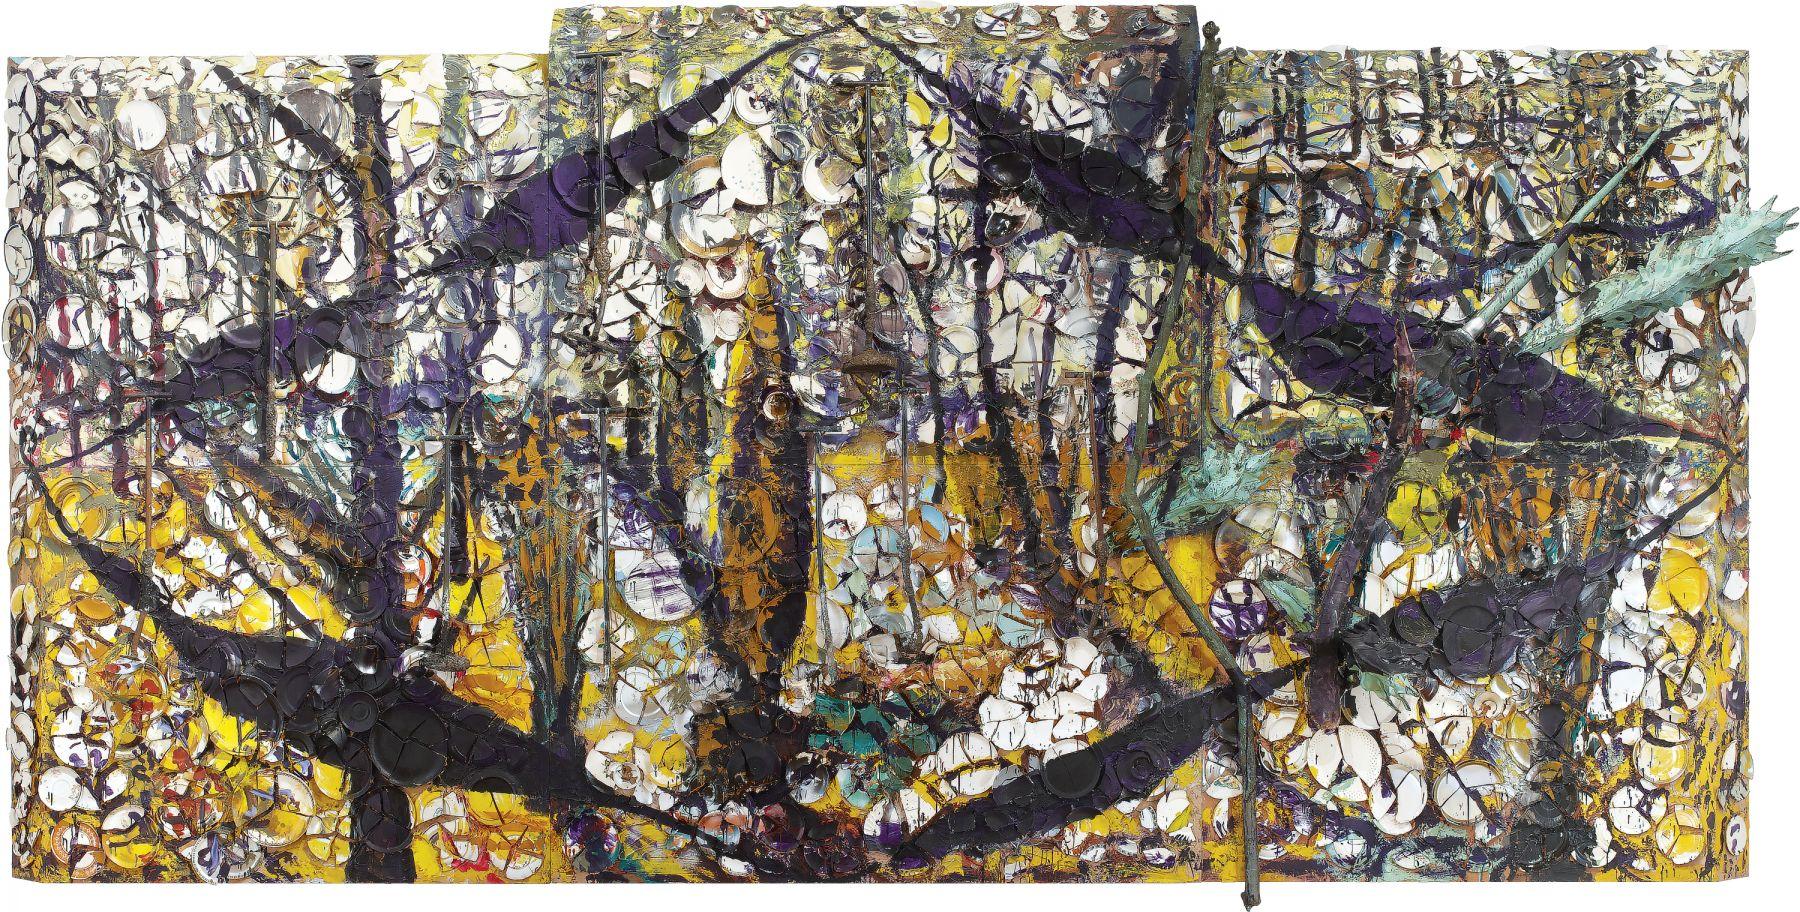 Julian Schnabel The Walk Home,1985